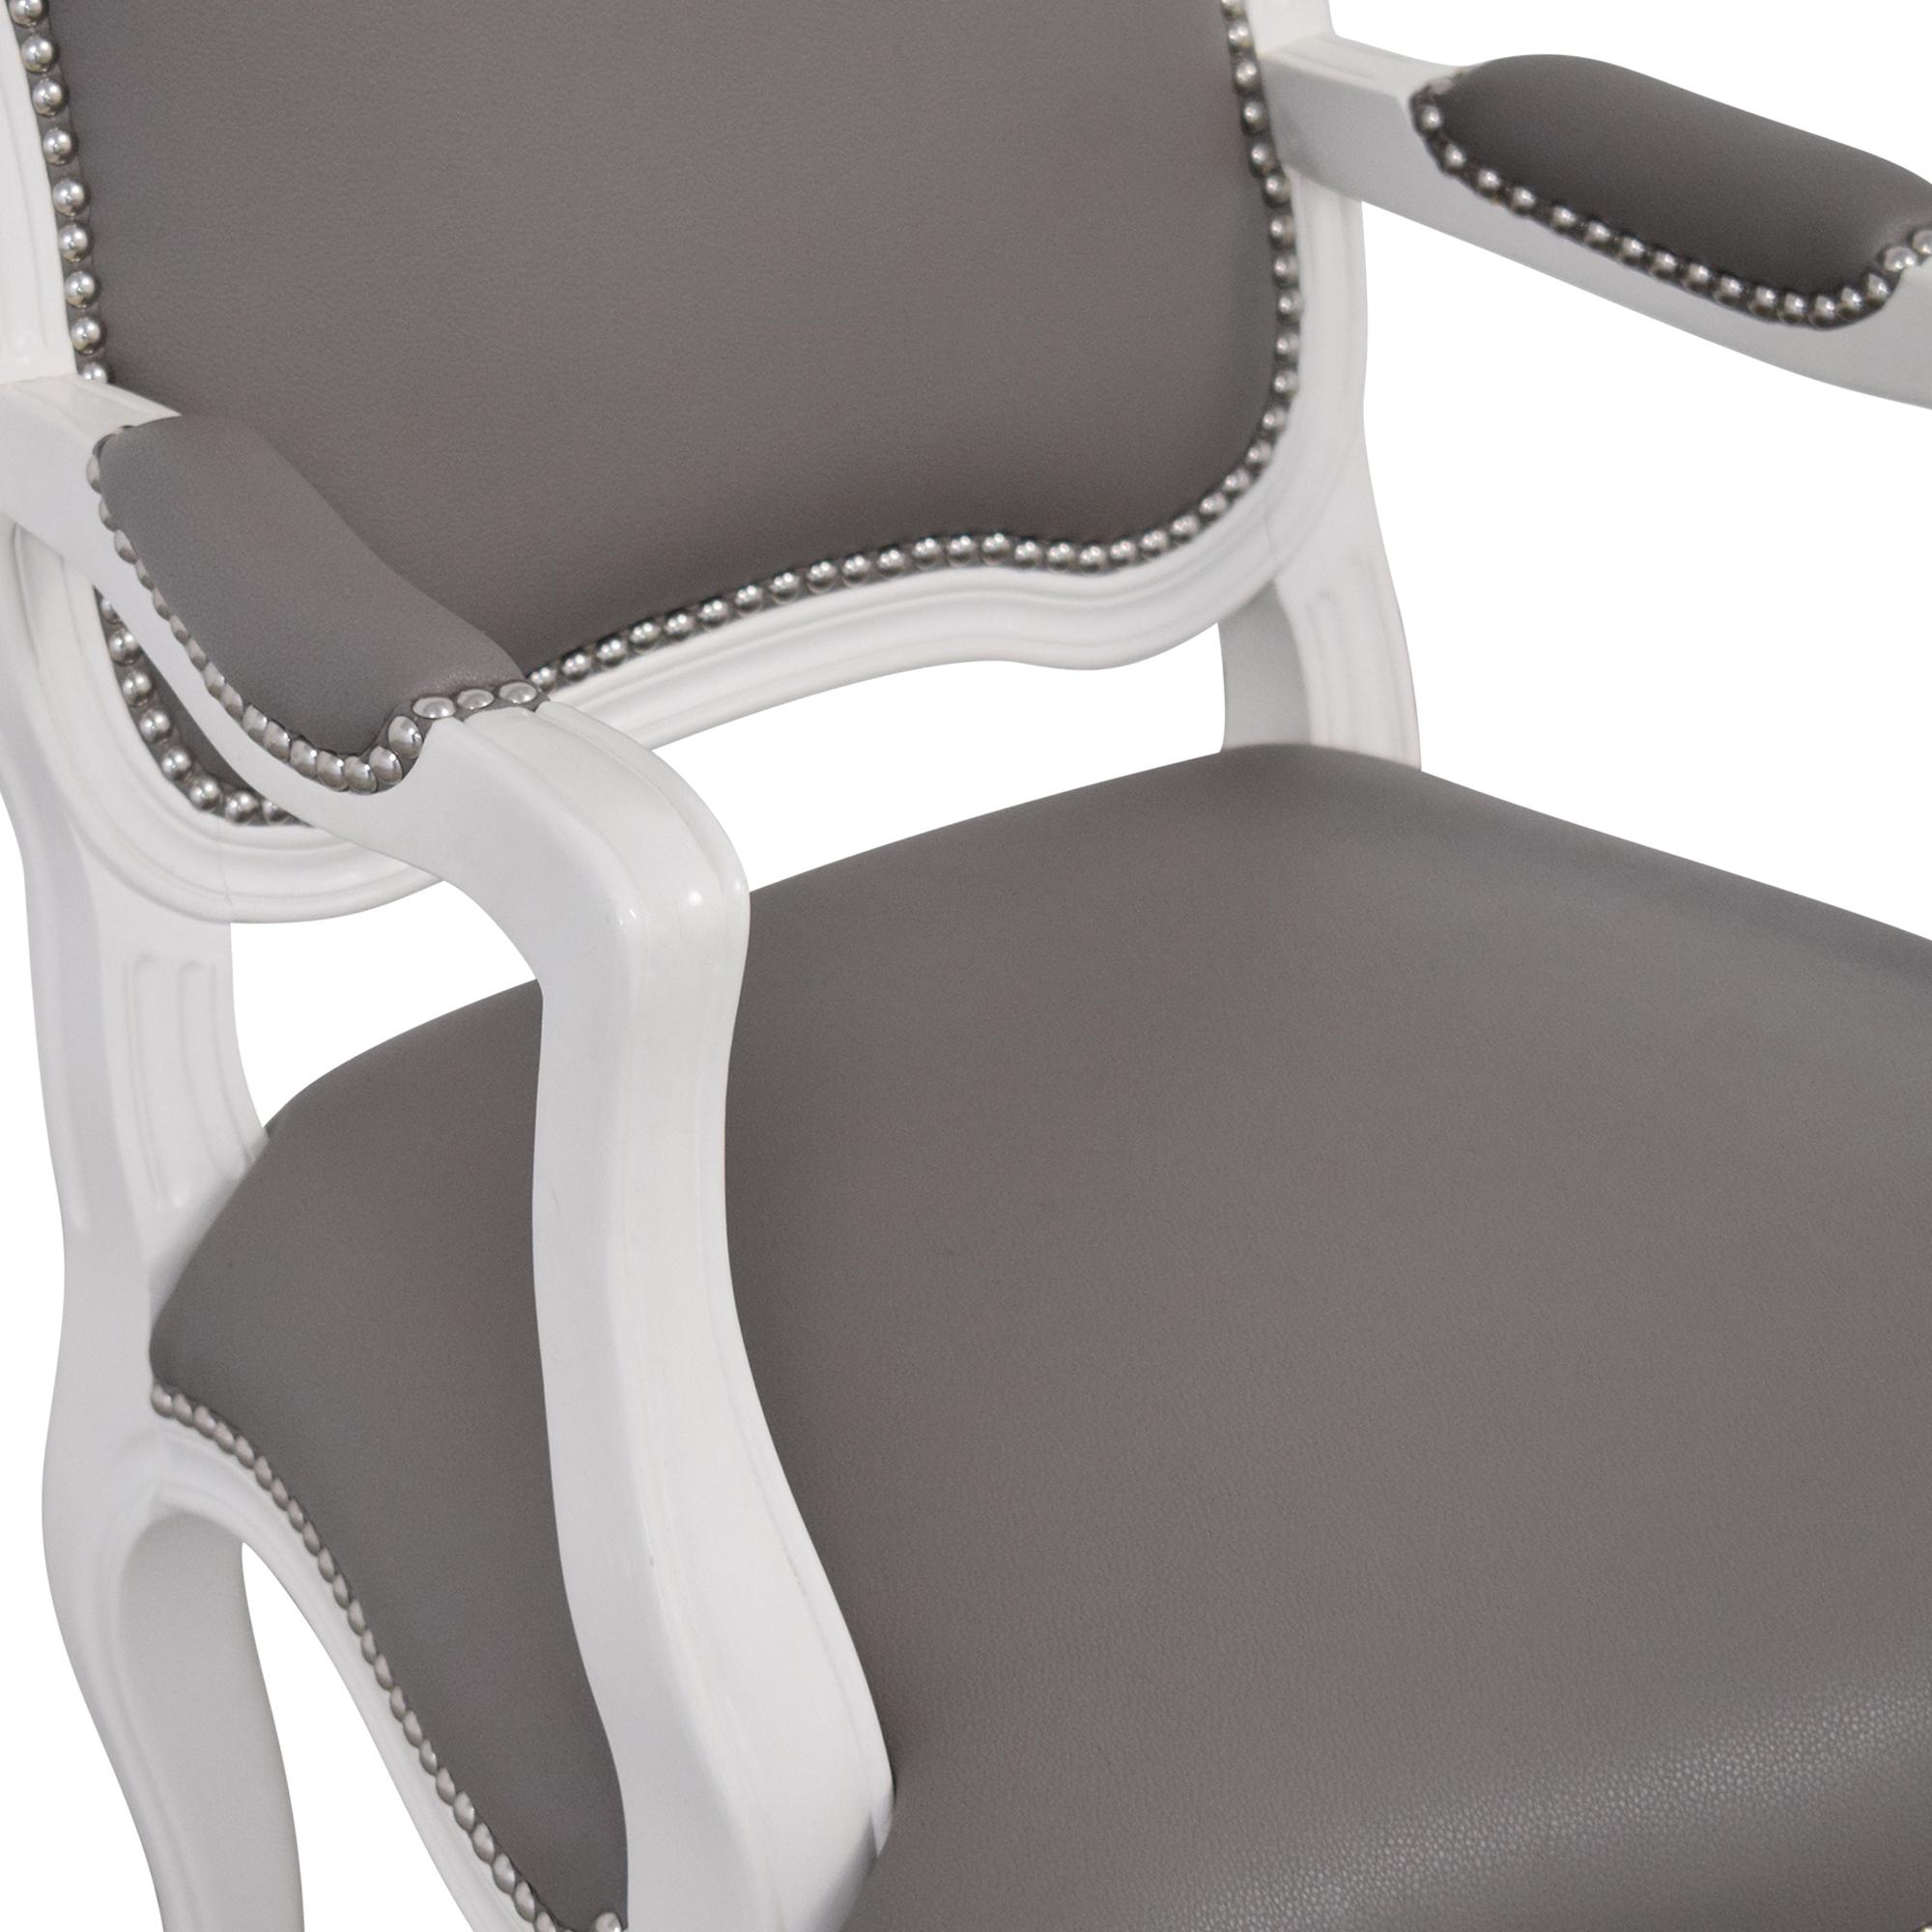 CB2 CB2 Stick Around Chair nj